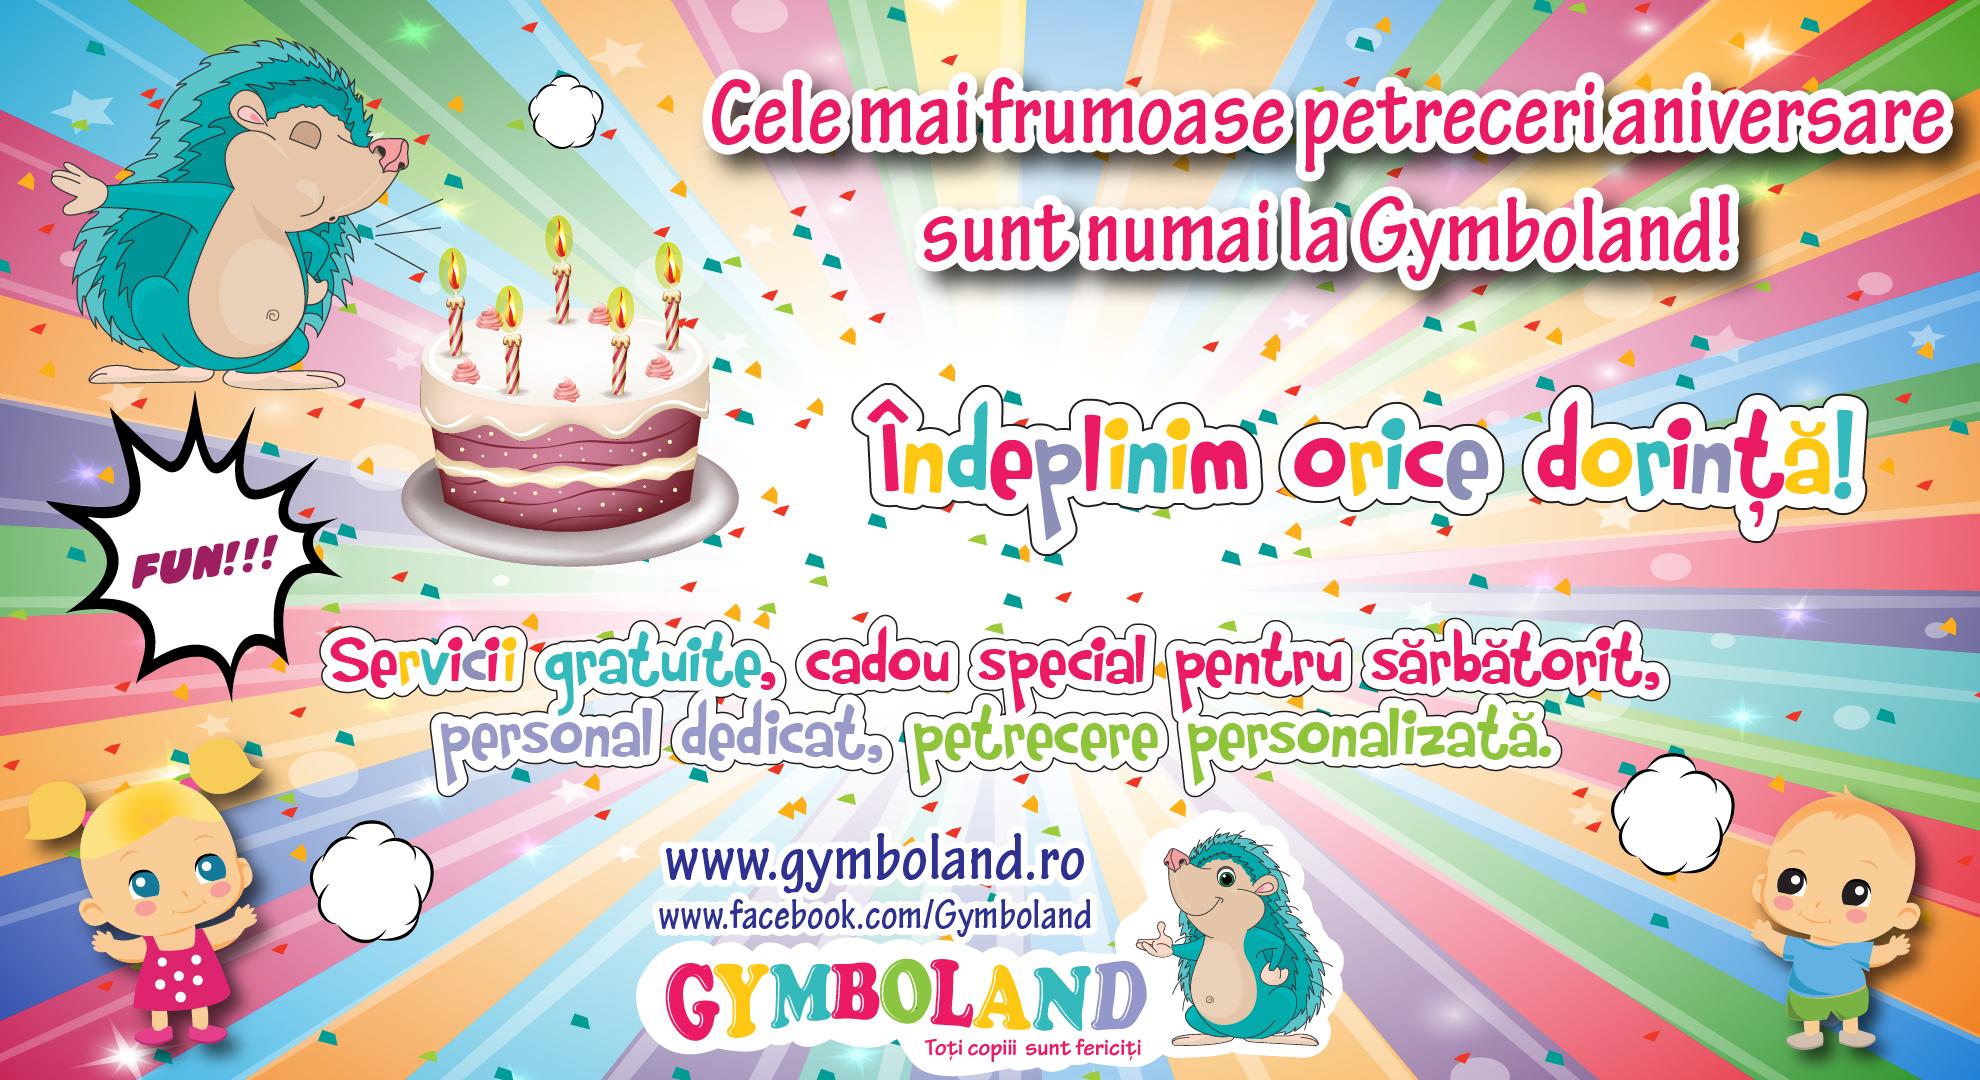 gymboland-promenada-web_1980x1080px